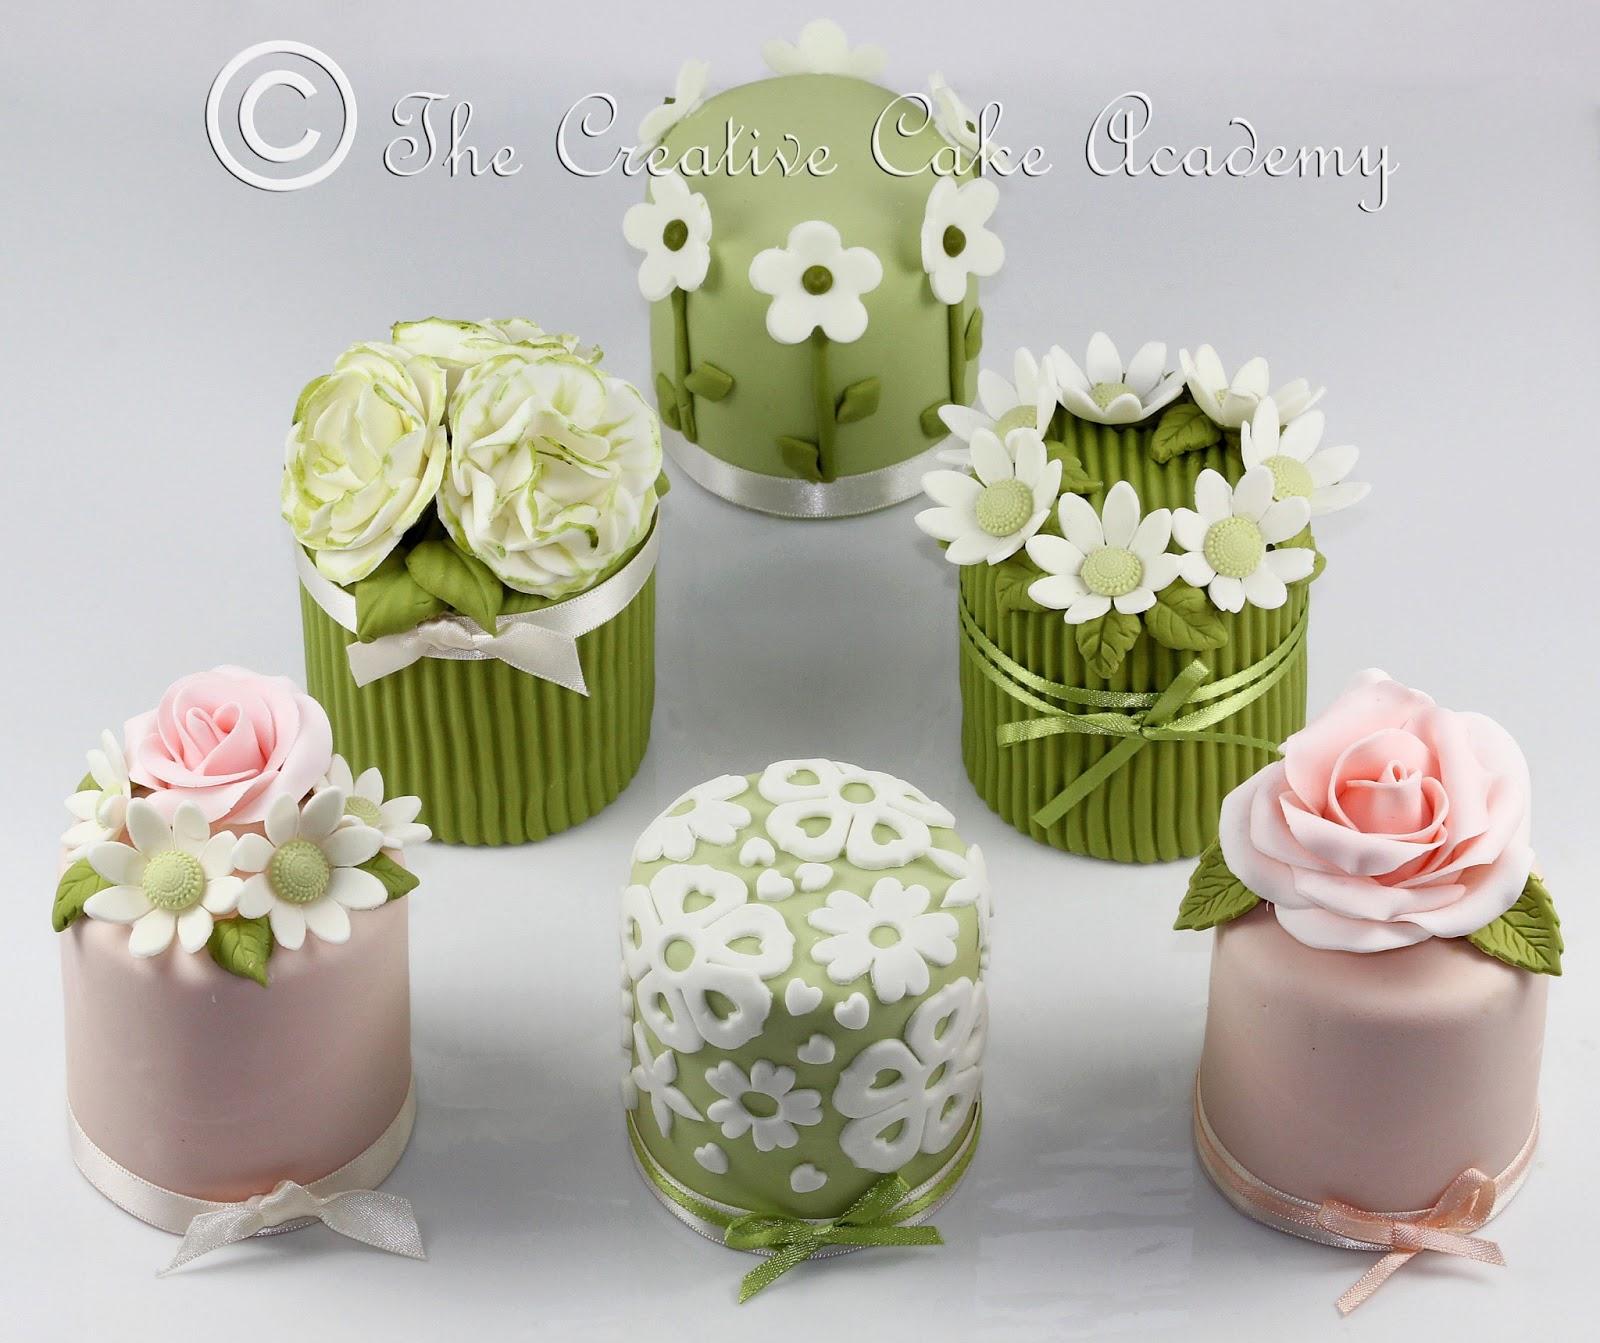 Wedding Cake Decorating Classes: The Creative Cake Academy: CAKE DECORATION CLASSES